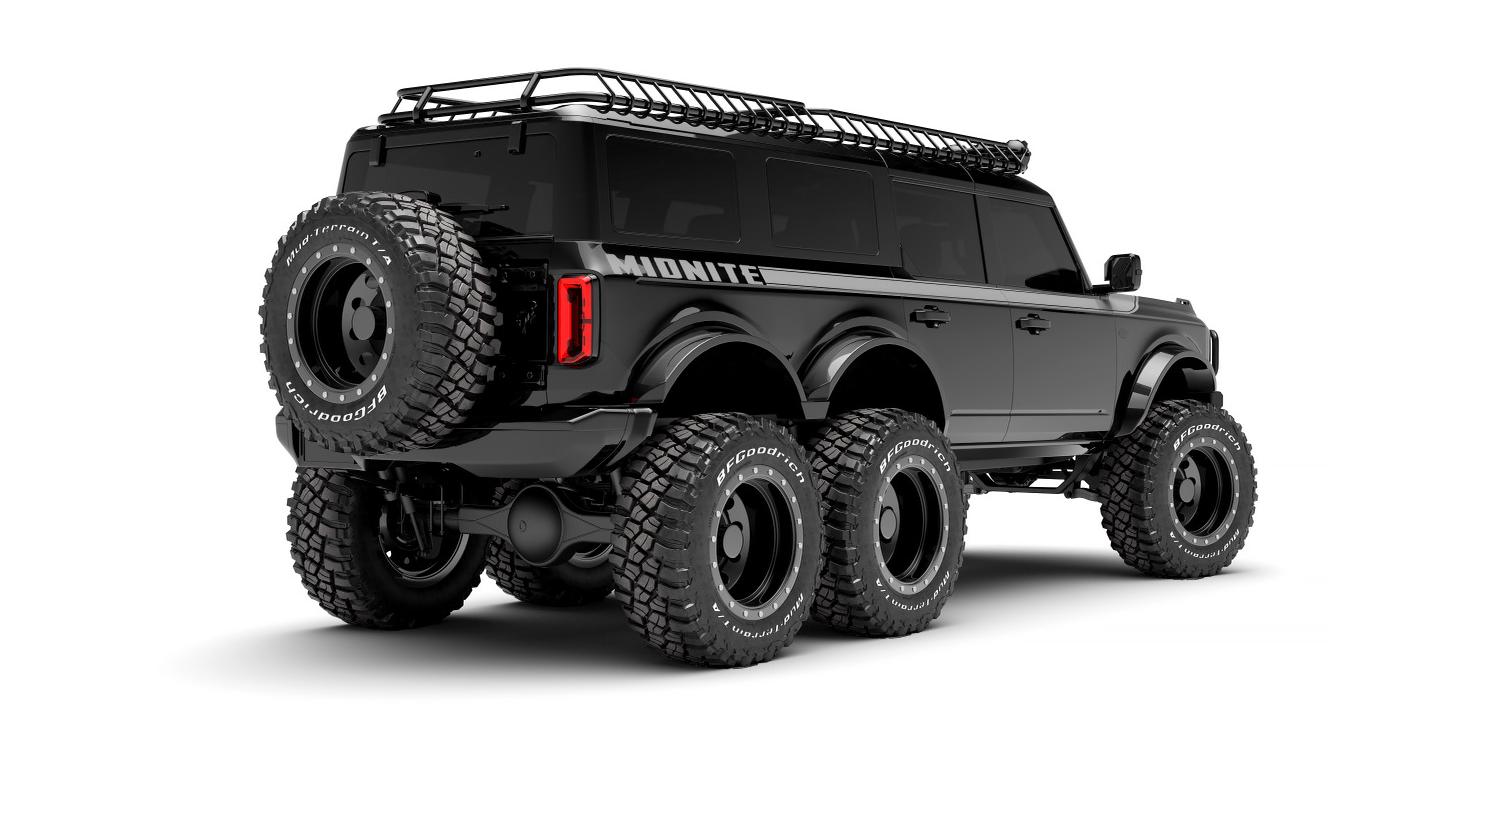 2021 Ford Bronco 6x6 MIDNITE Edition